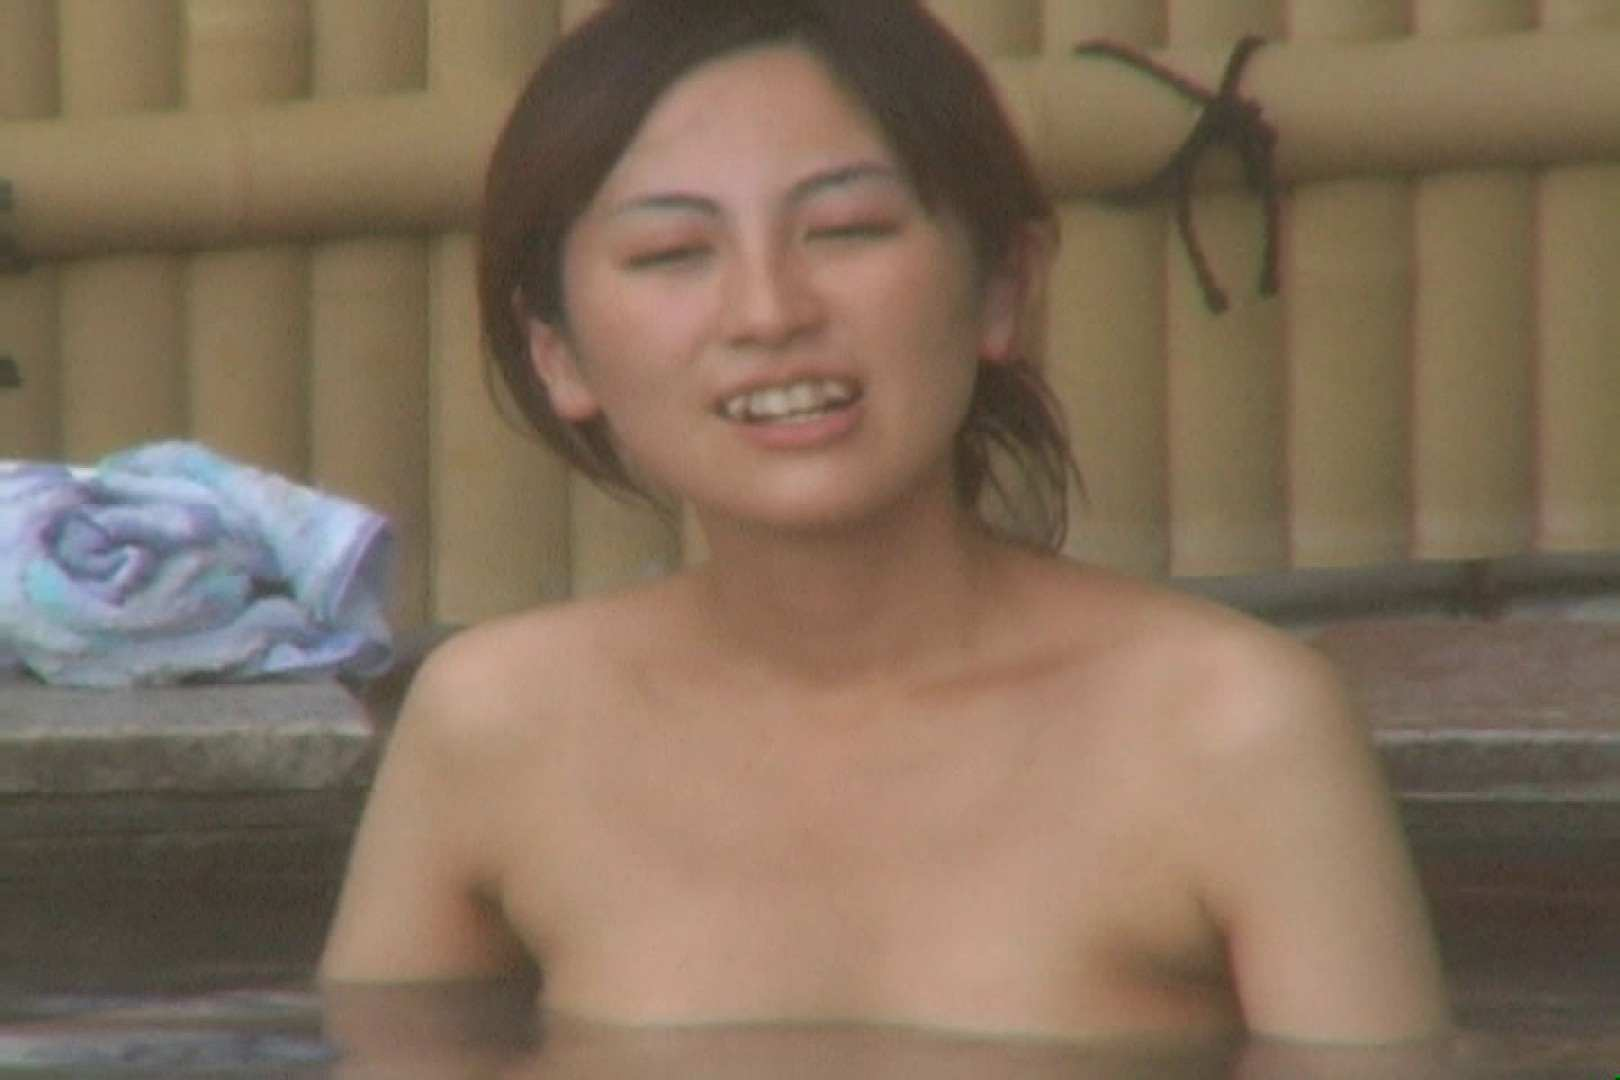 Aquaな露天風呂Vol.26【VIP】 OLセックス 盗み撮りオマンコ動画キャプチャ 59画像 50